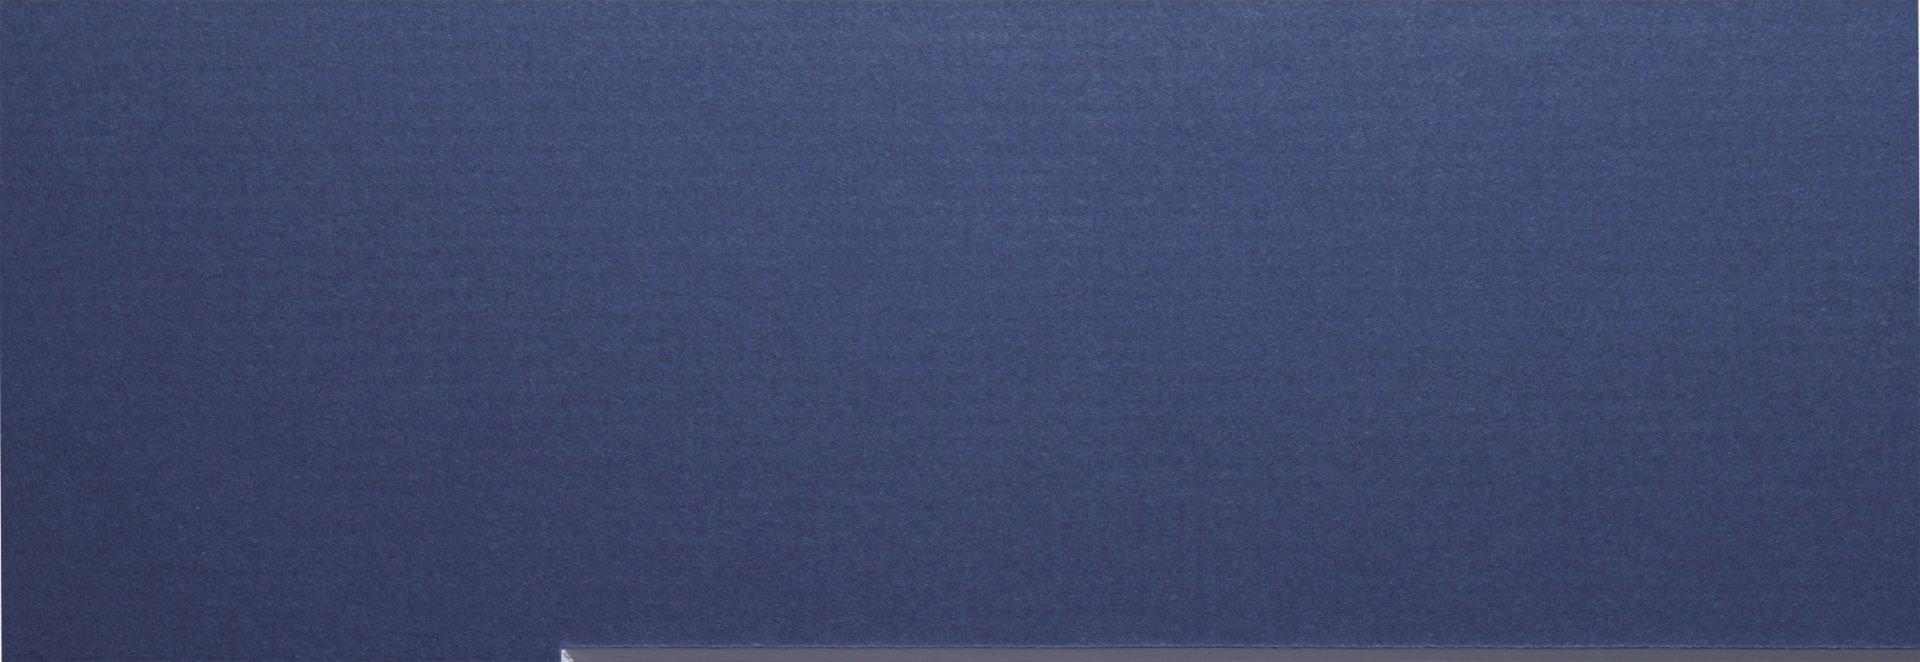 GSRM1081_G1081 Volcano Blue